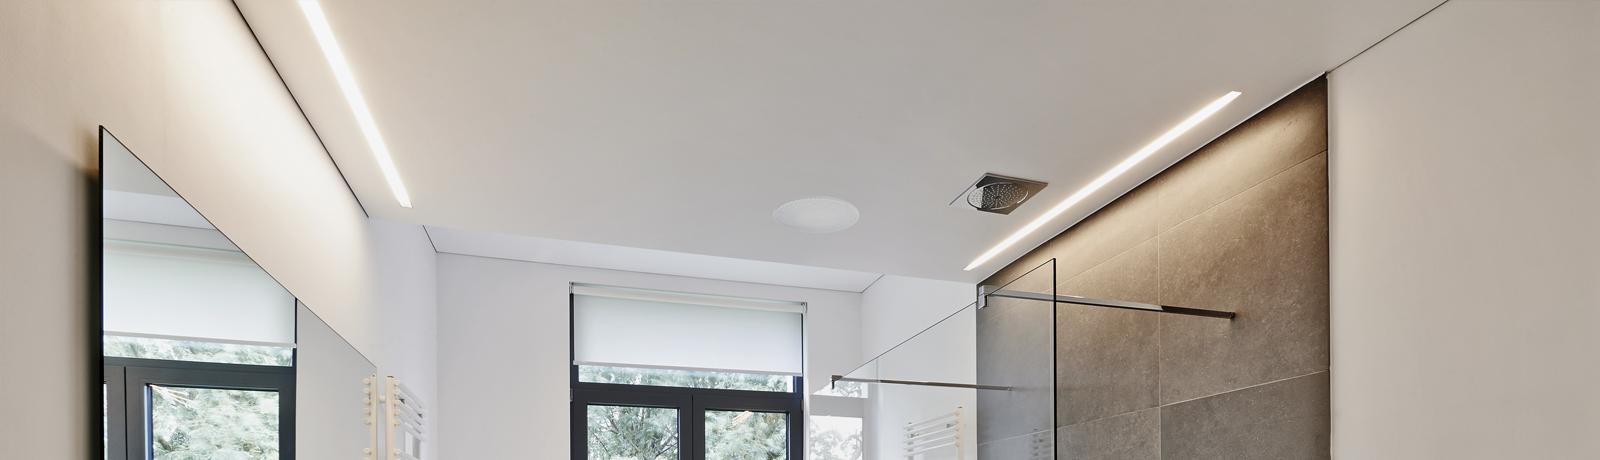 Bathroom Ceiling Speakers Lithe Audio Ltd, Speakers For Bathroom Ceiling